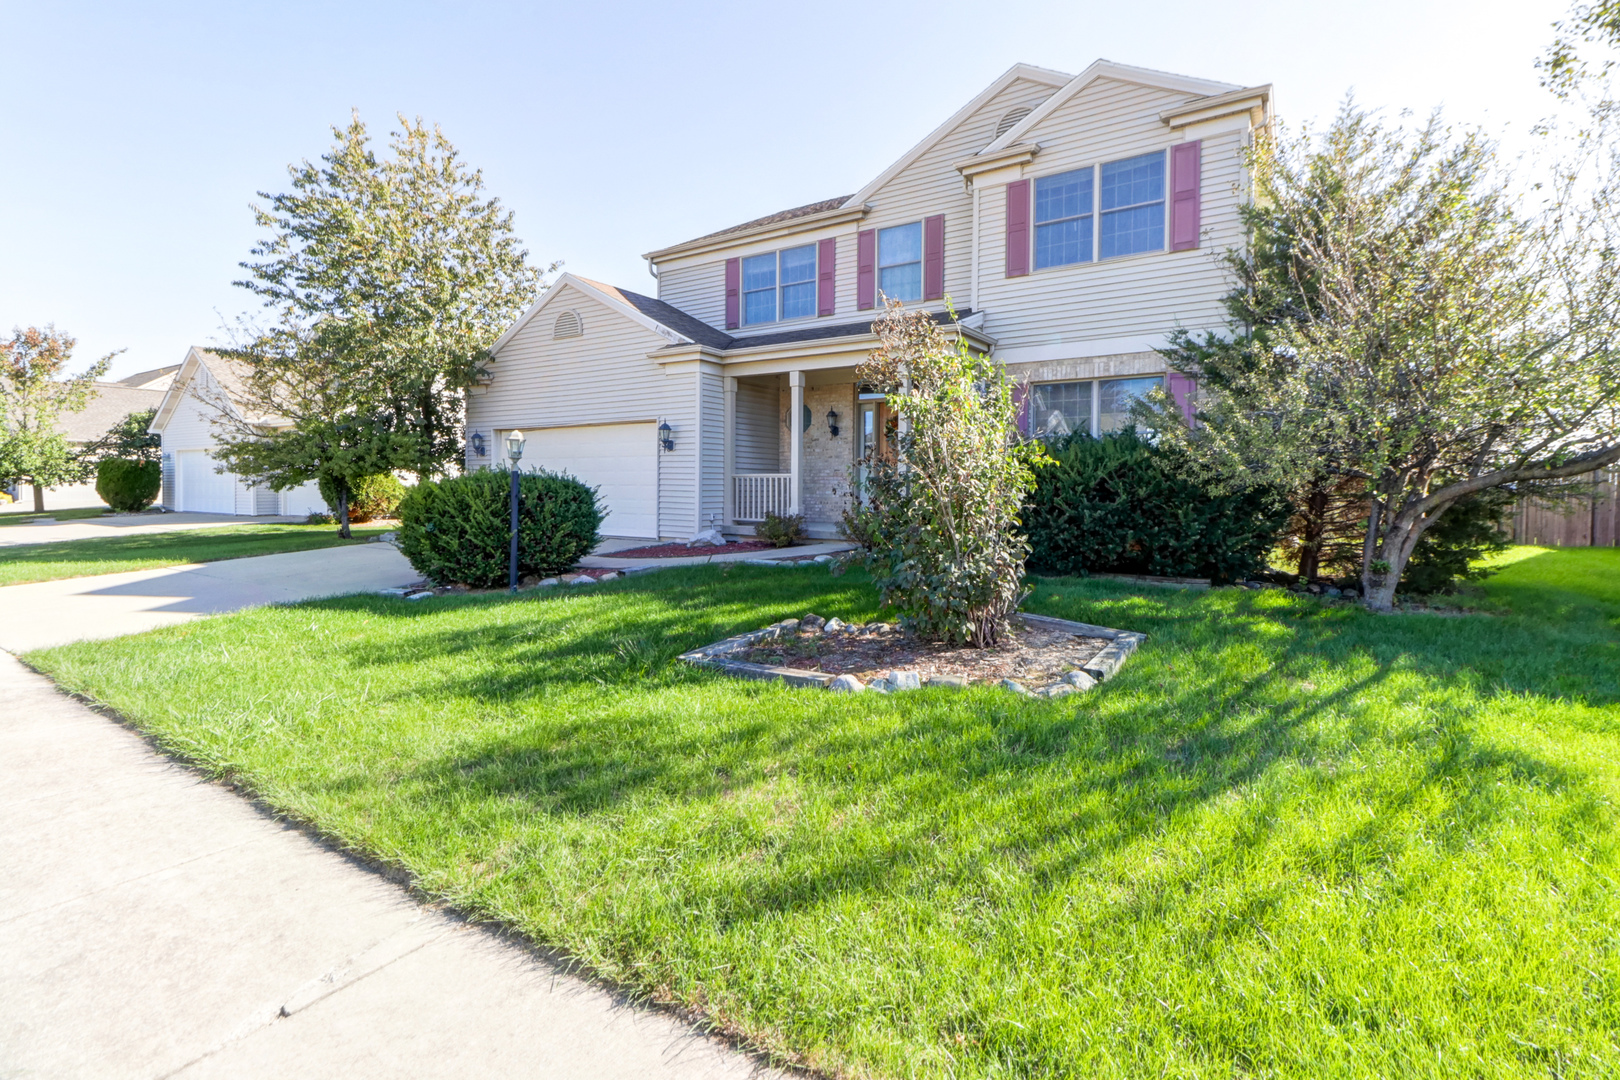 3006 Wynstone, Champaign, Illinois, 61822